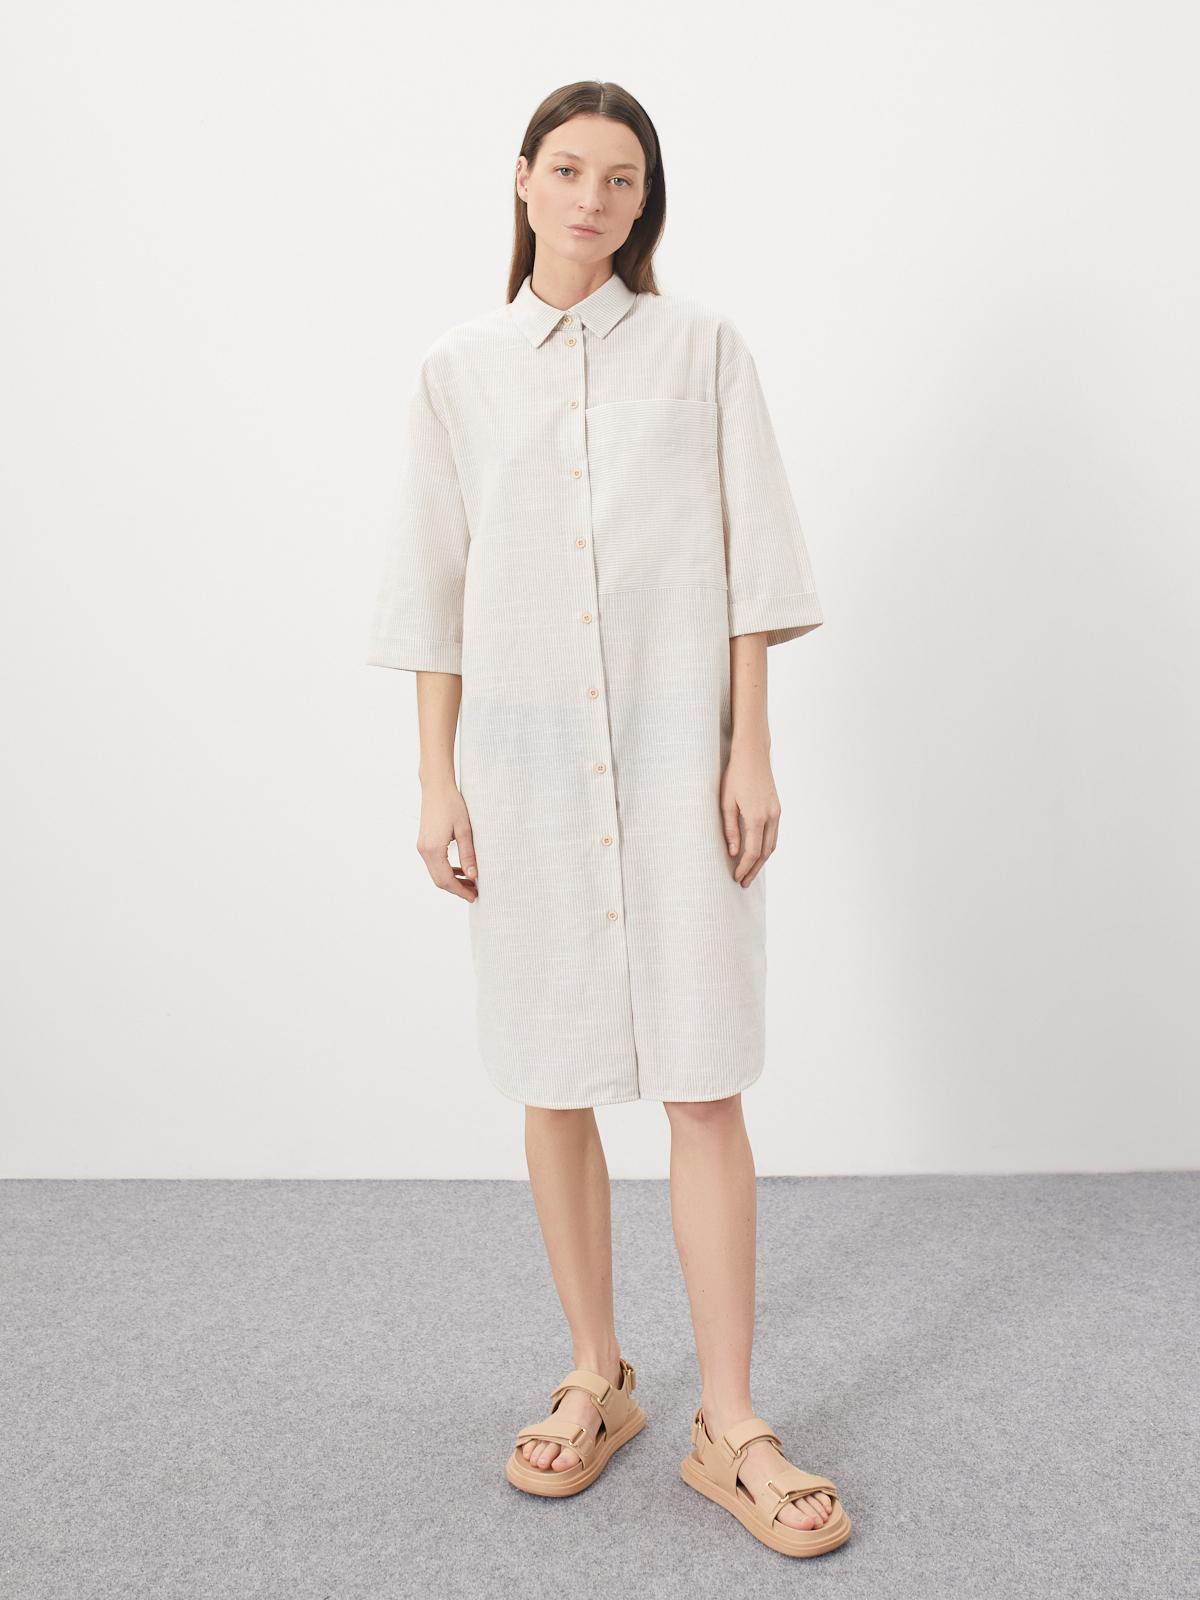 Платье-рубашка Bram с большим карманом